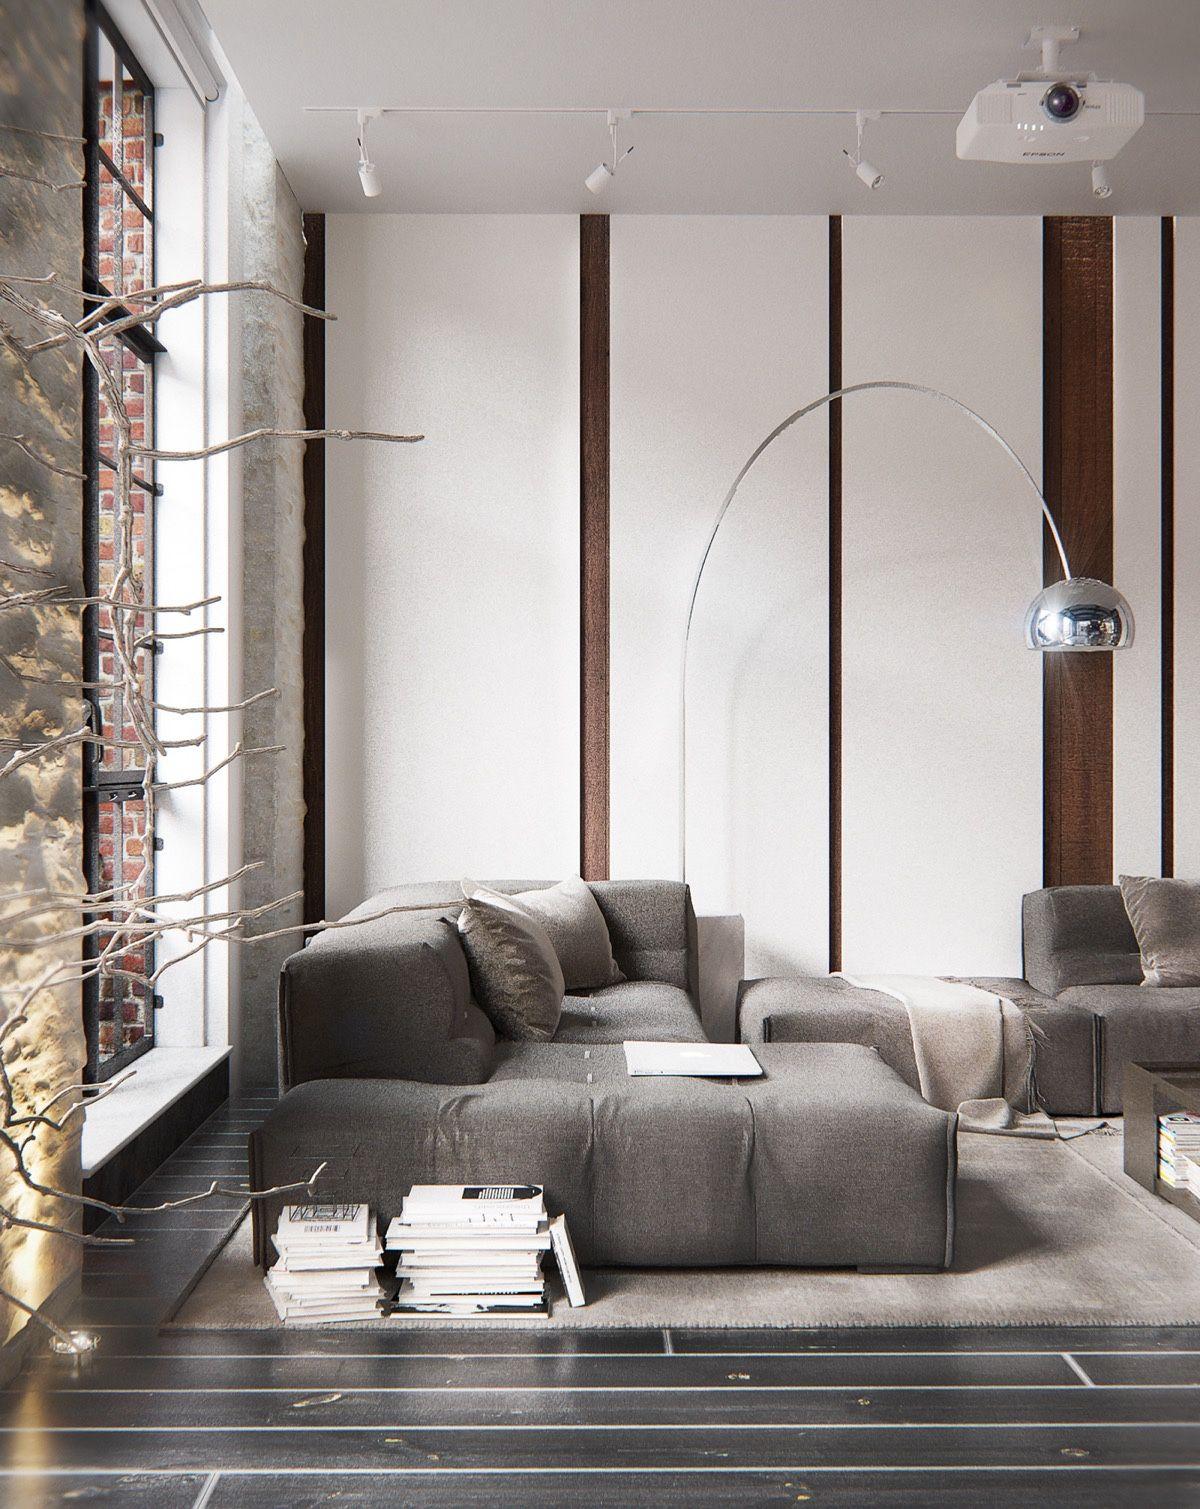 2 elegantes y acogedores lofts cosmopolitas - Taringa!                                                                                                                                                                                 More